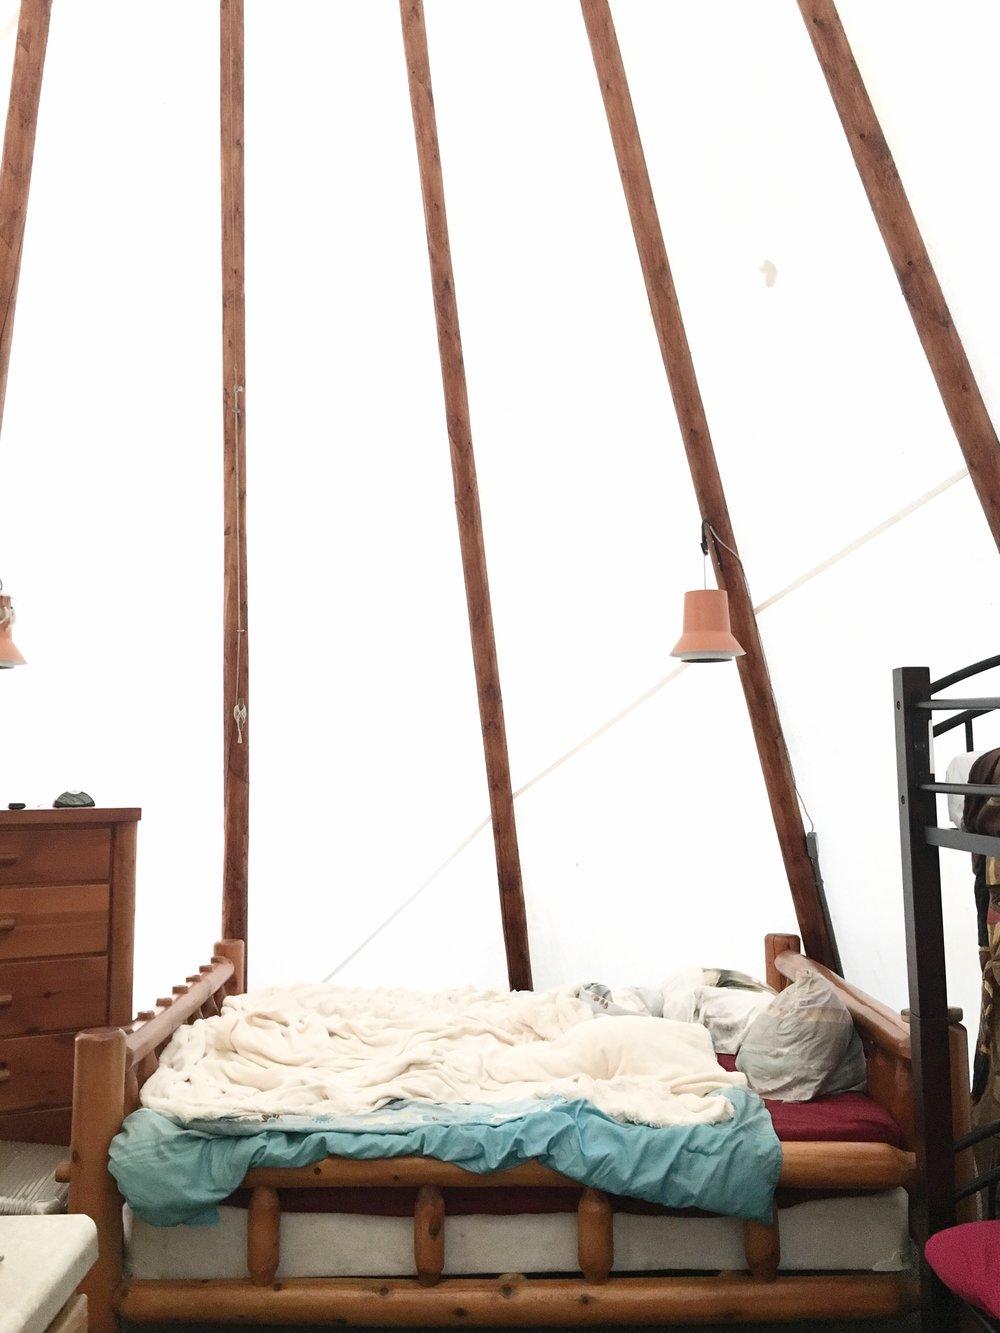 our adorable sleep area.